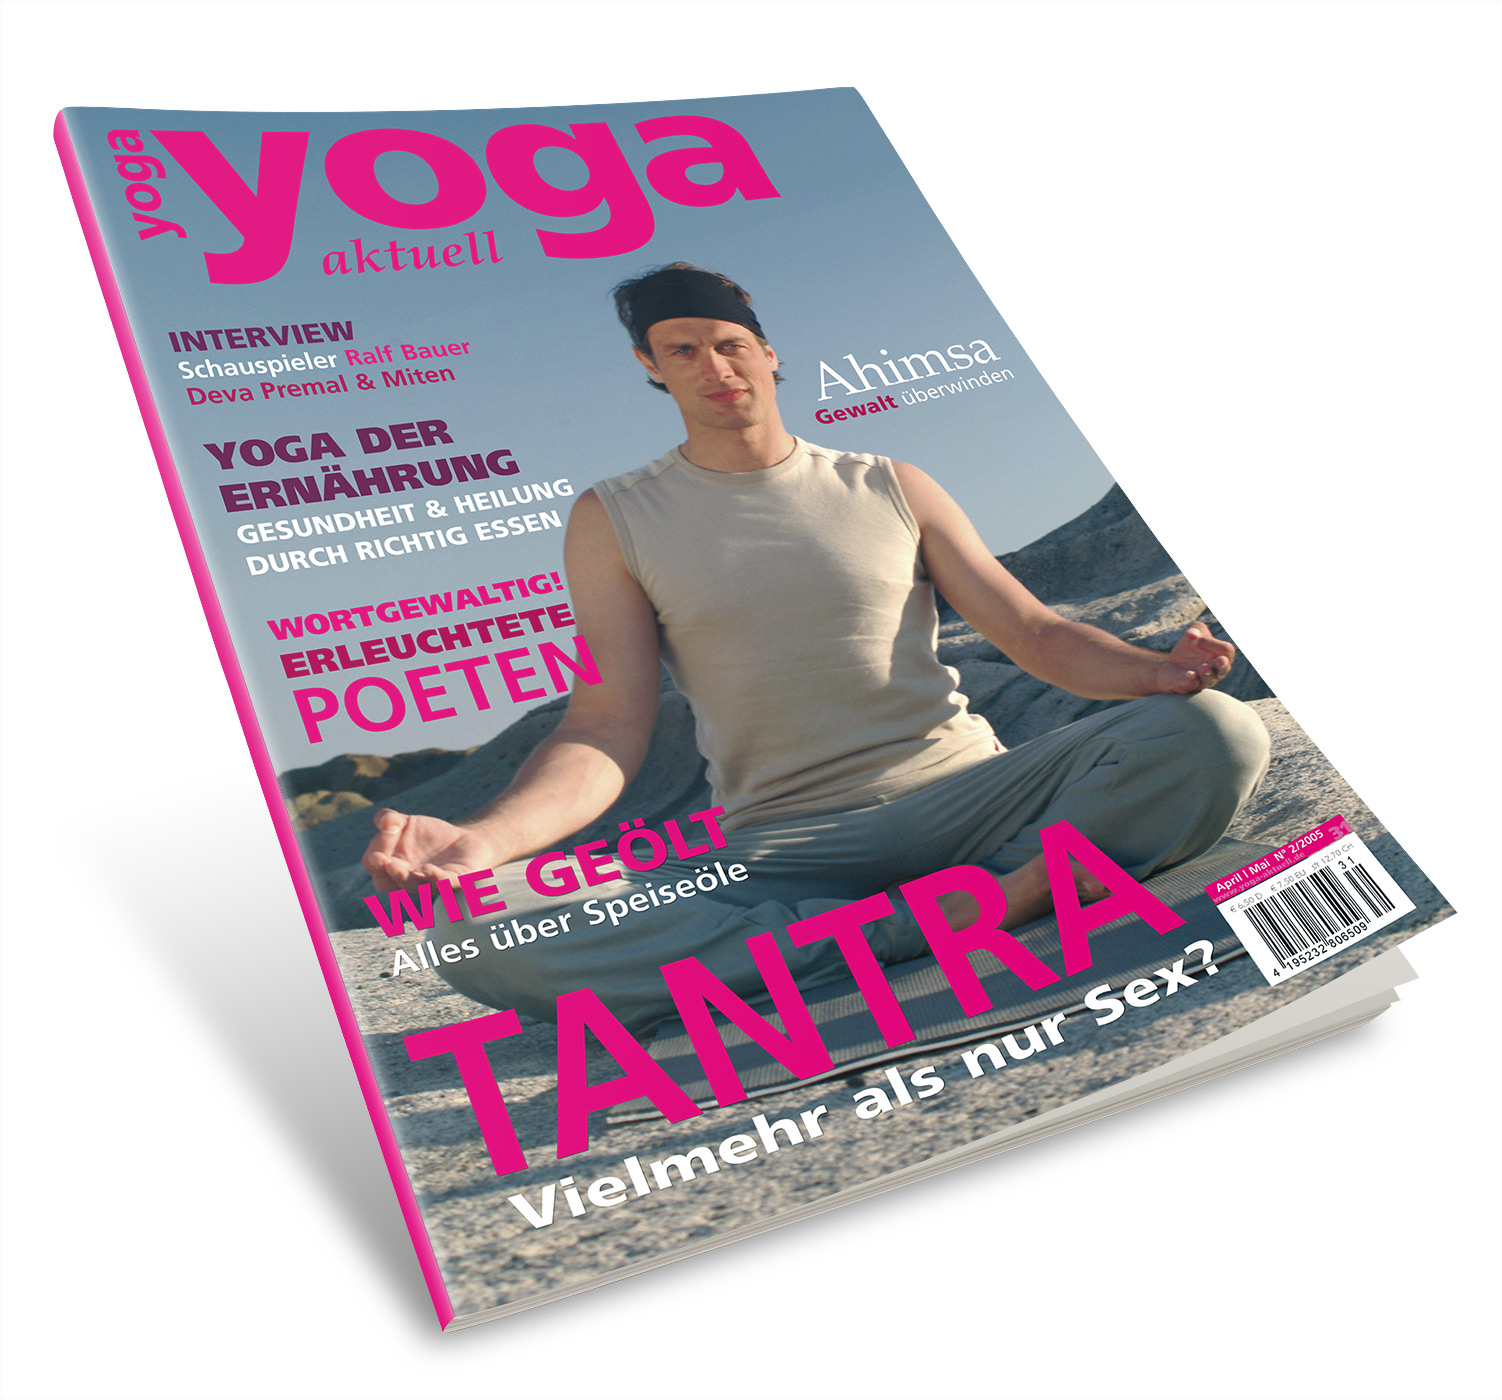 Yoga Aktuell 31 - 02/2005